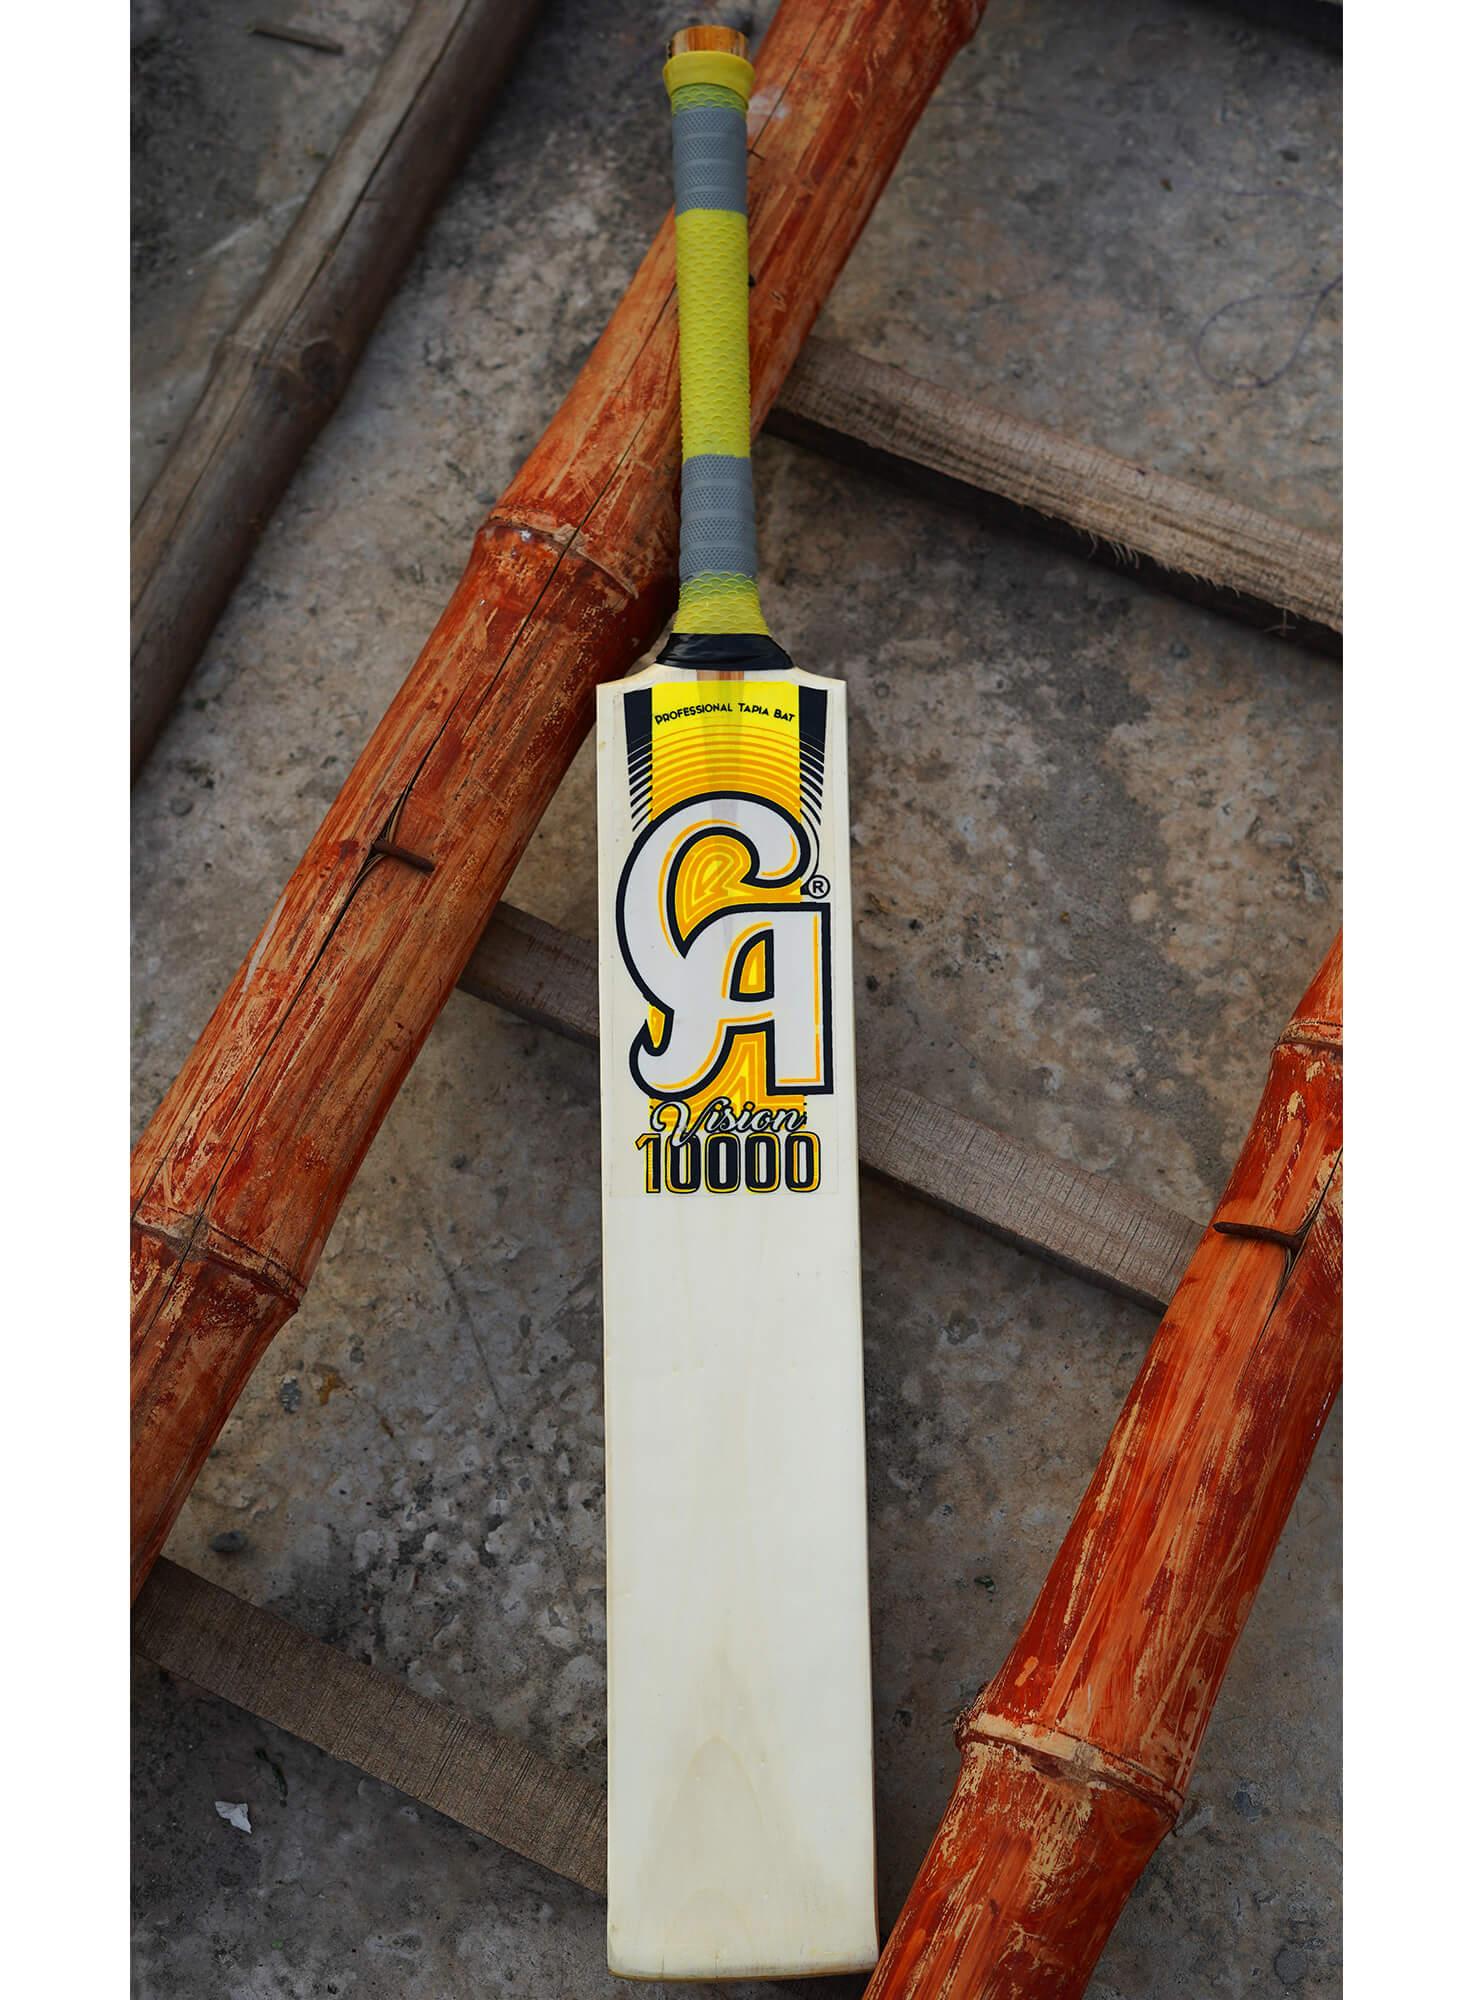 ca vision 10000 bat